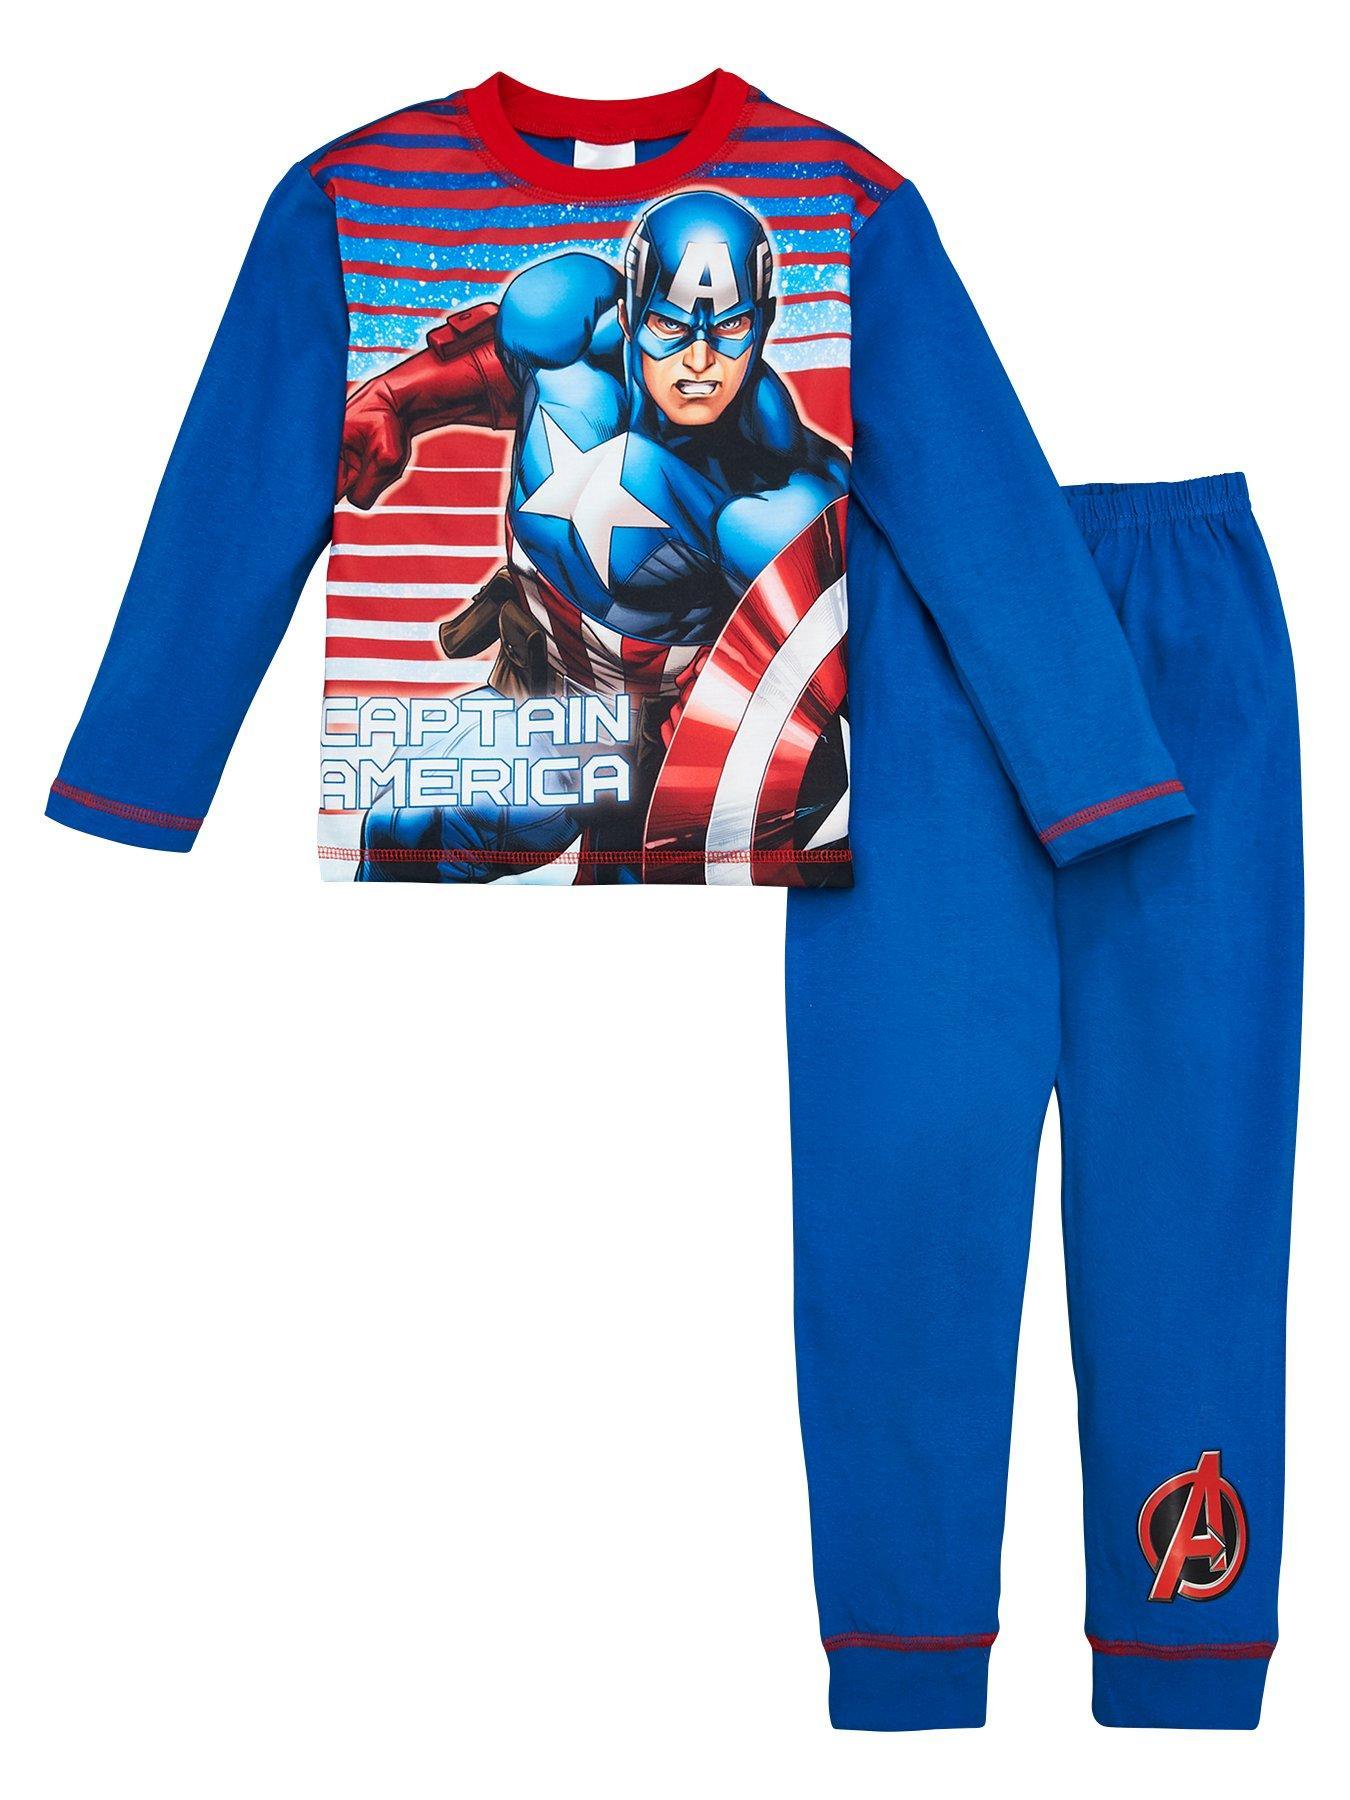 Boys//Childrens Pyjamas//Pjs Winter Cosy Brushed Fleece Full Pajama set LongSleeve